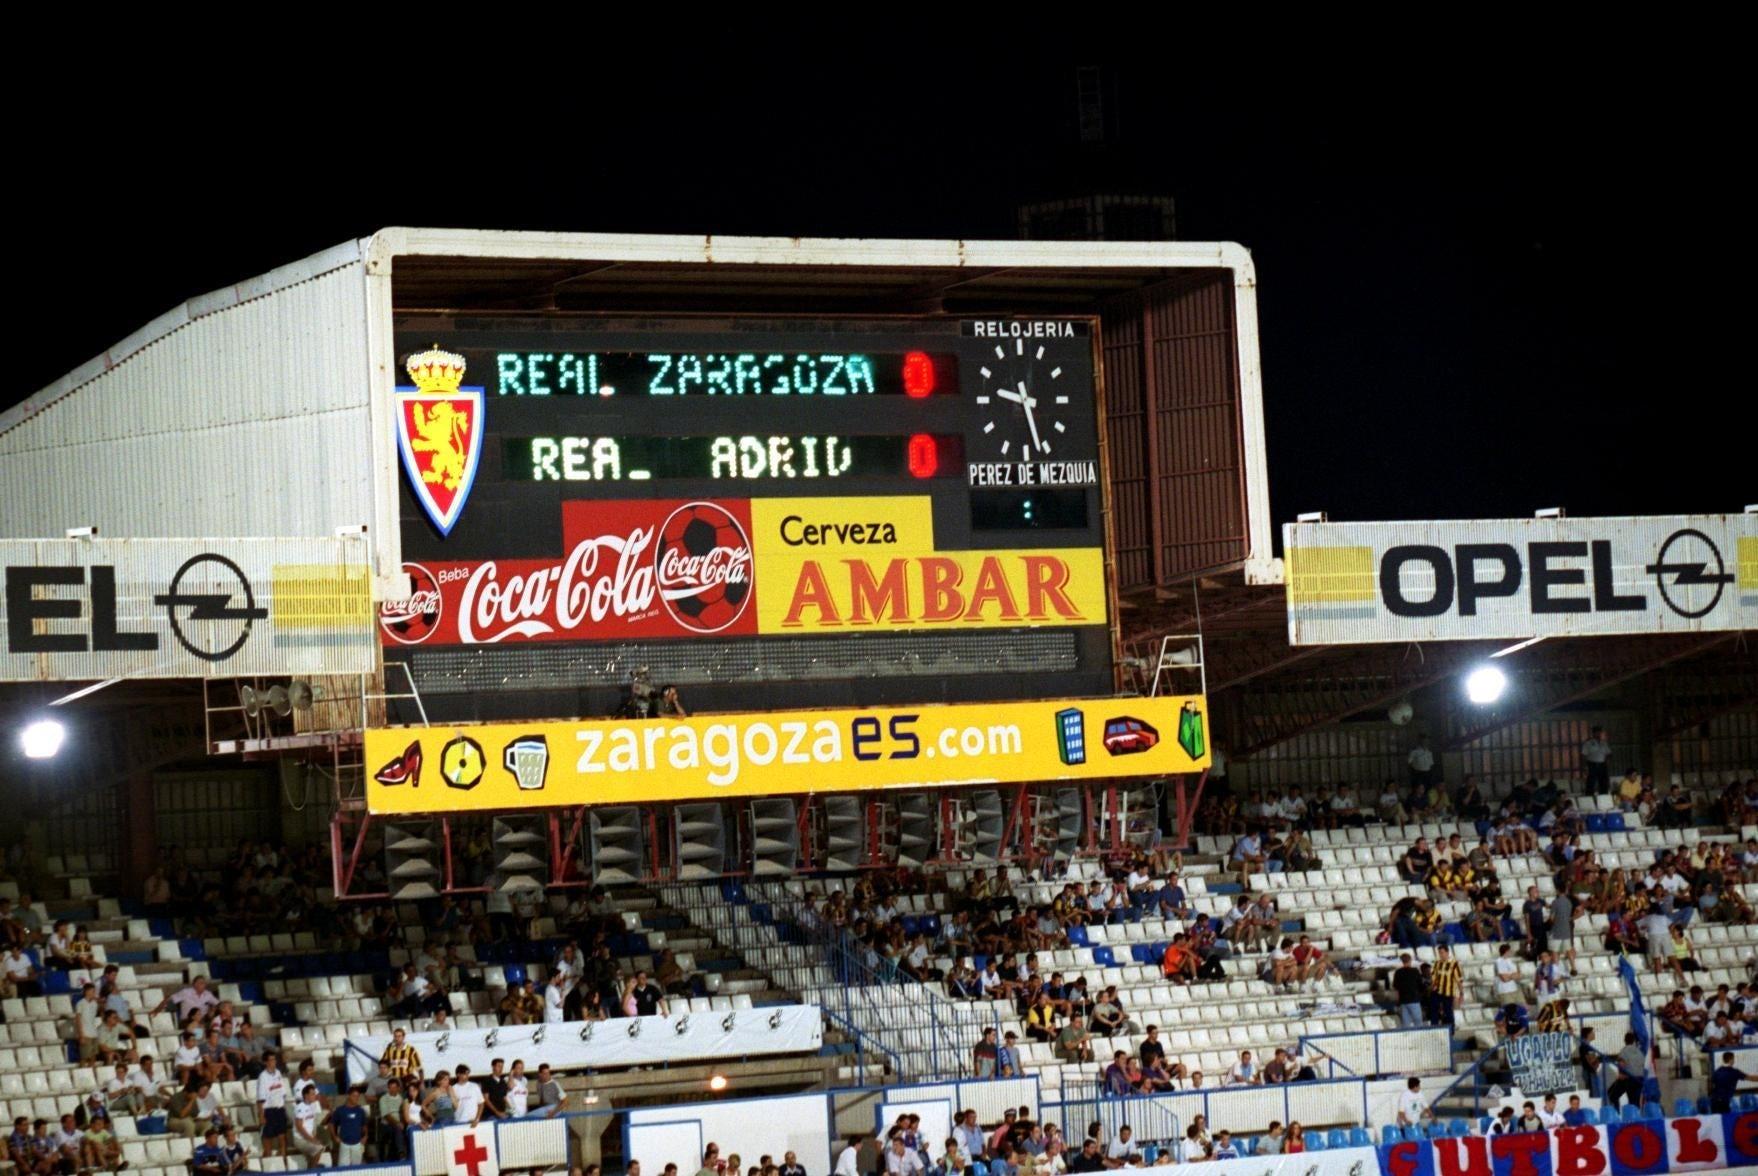 A close up of the scoreboard at Estadio de La Romareda on August 19, 2001